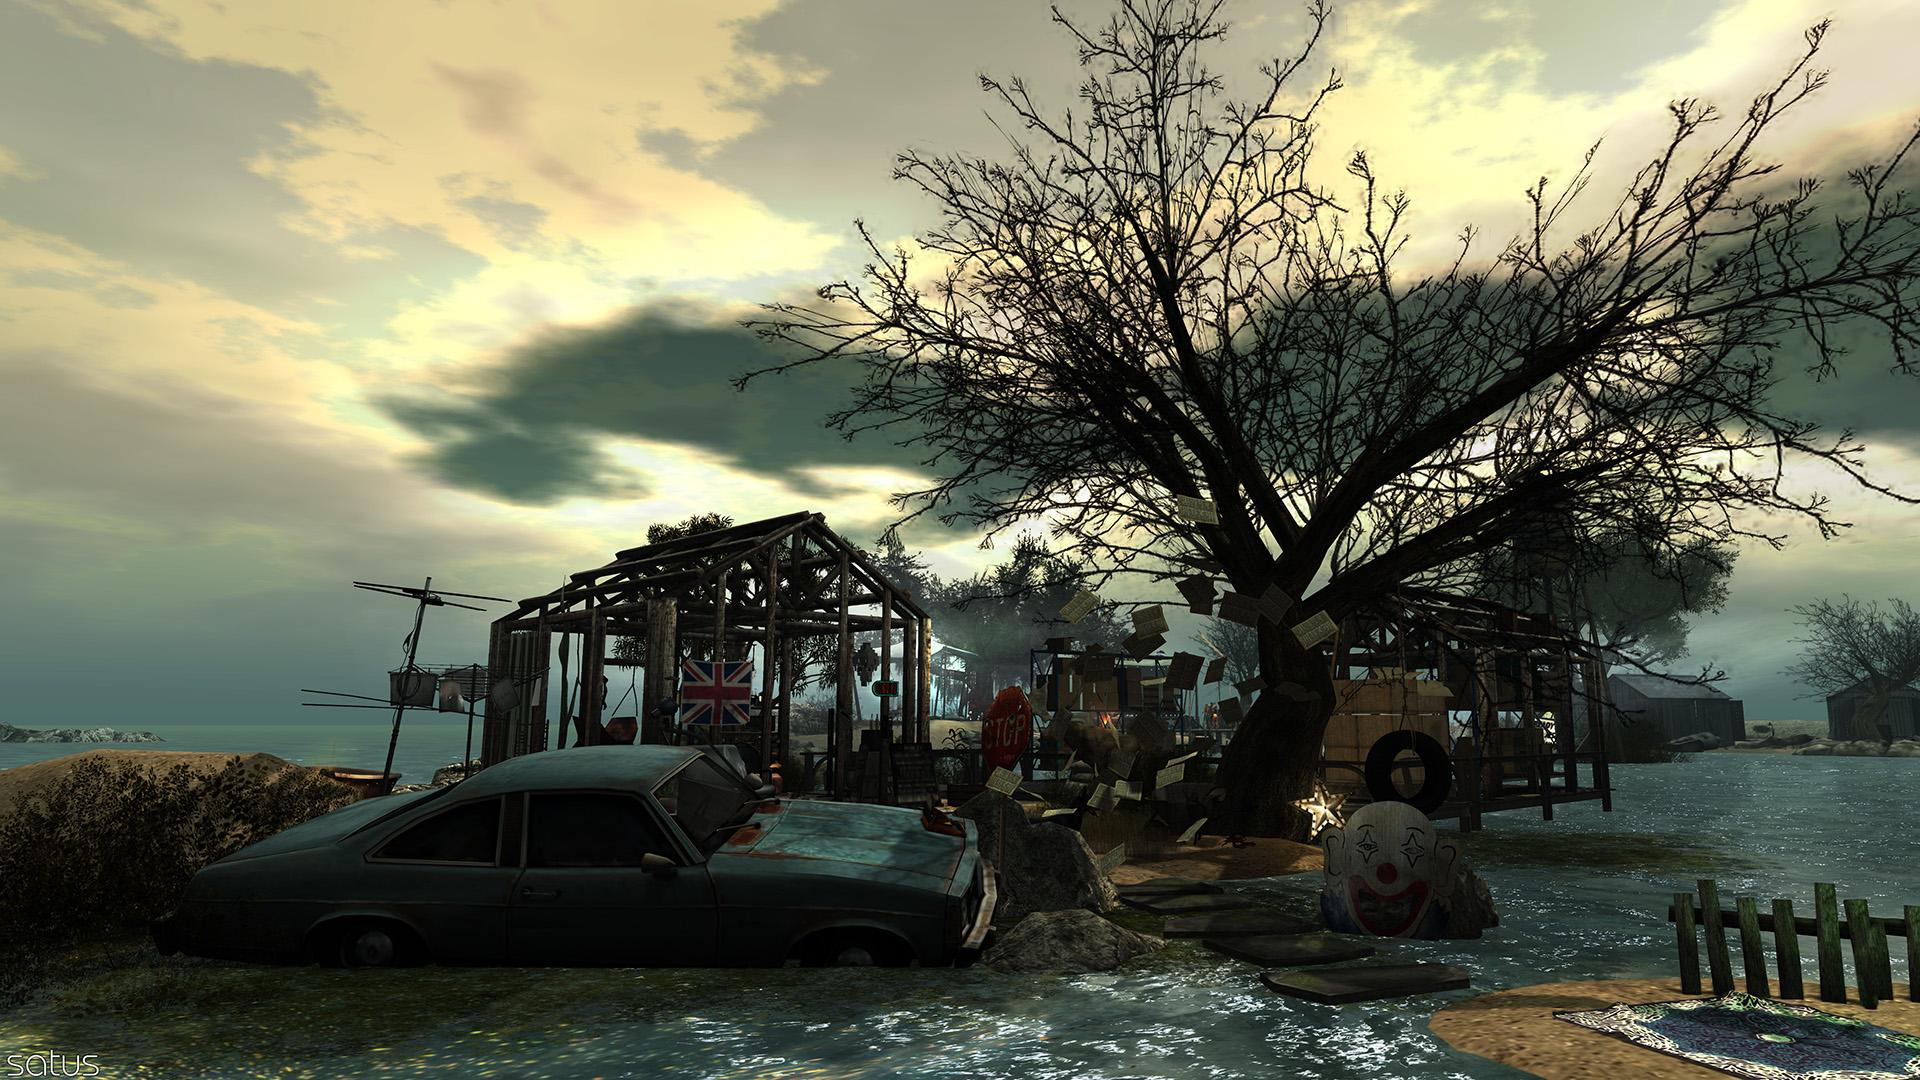 SL Travel: junk